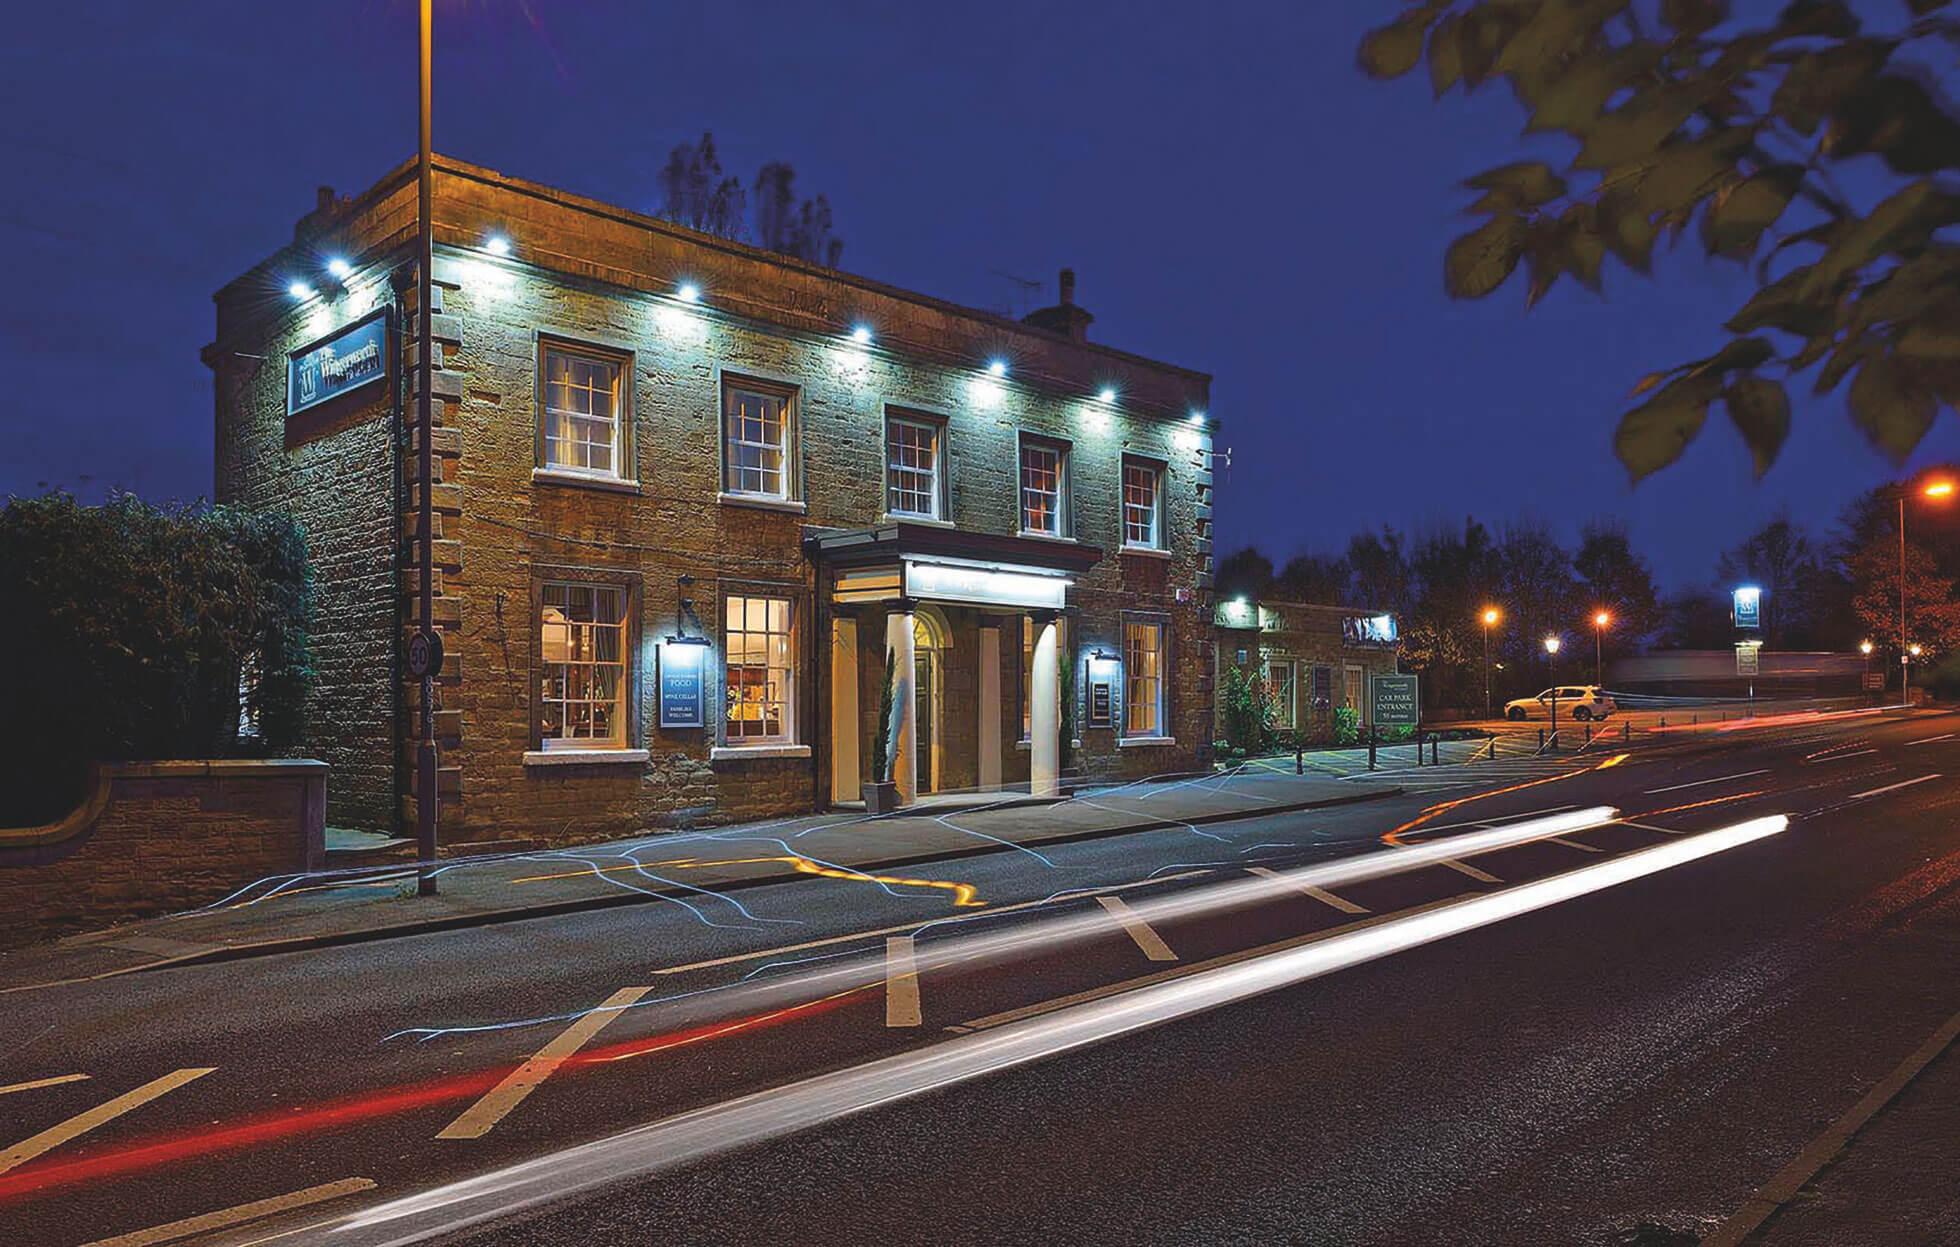 wingerworth pub and kitchen